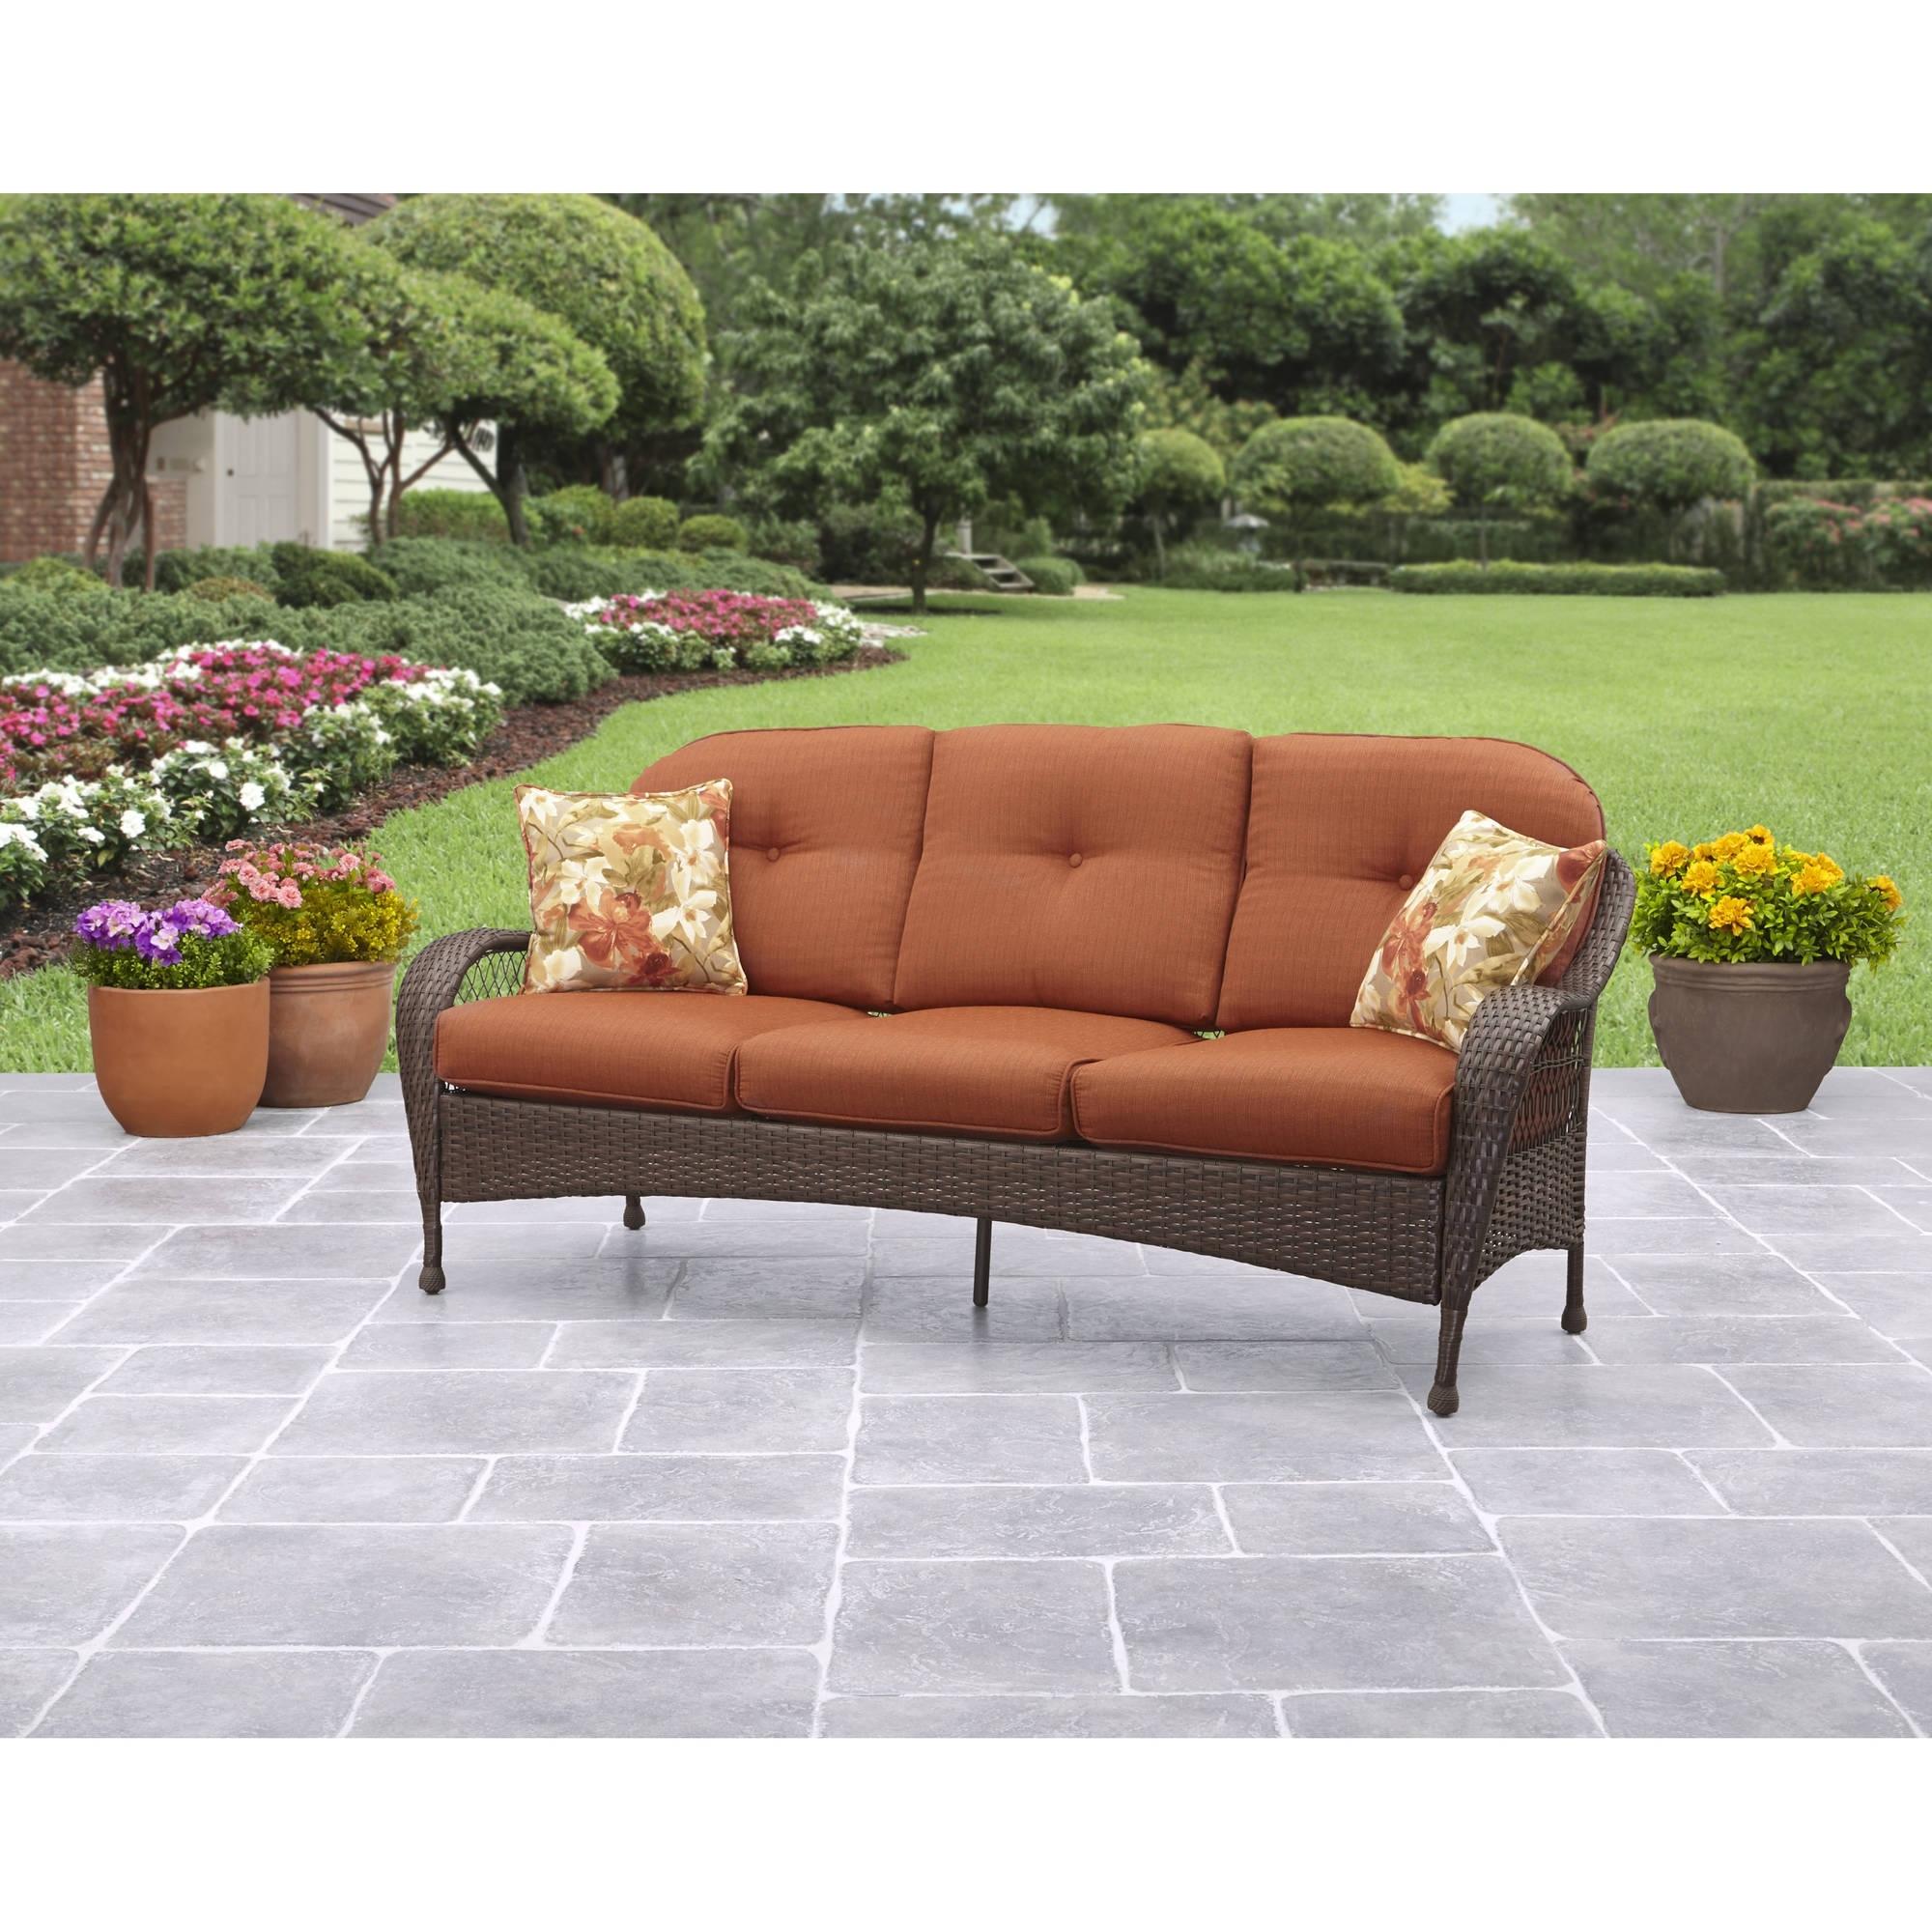 Better Homes And Gardens Azalea Ridge Outdoor Sofa, Seats 3 Regarding Most Recently Released Patio Sofas (View 3 of 20)